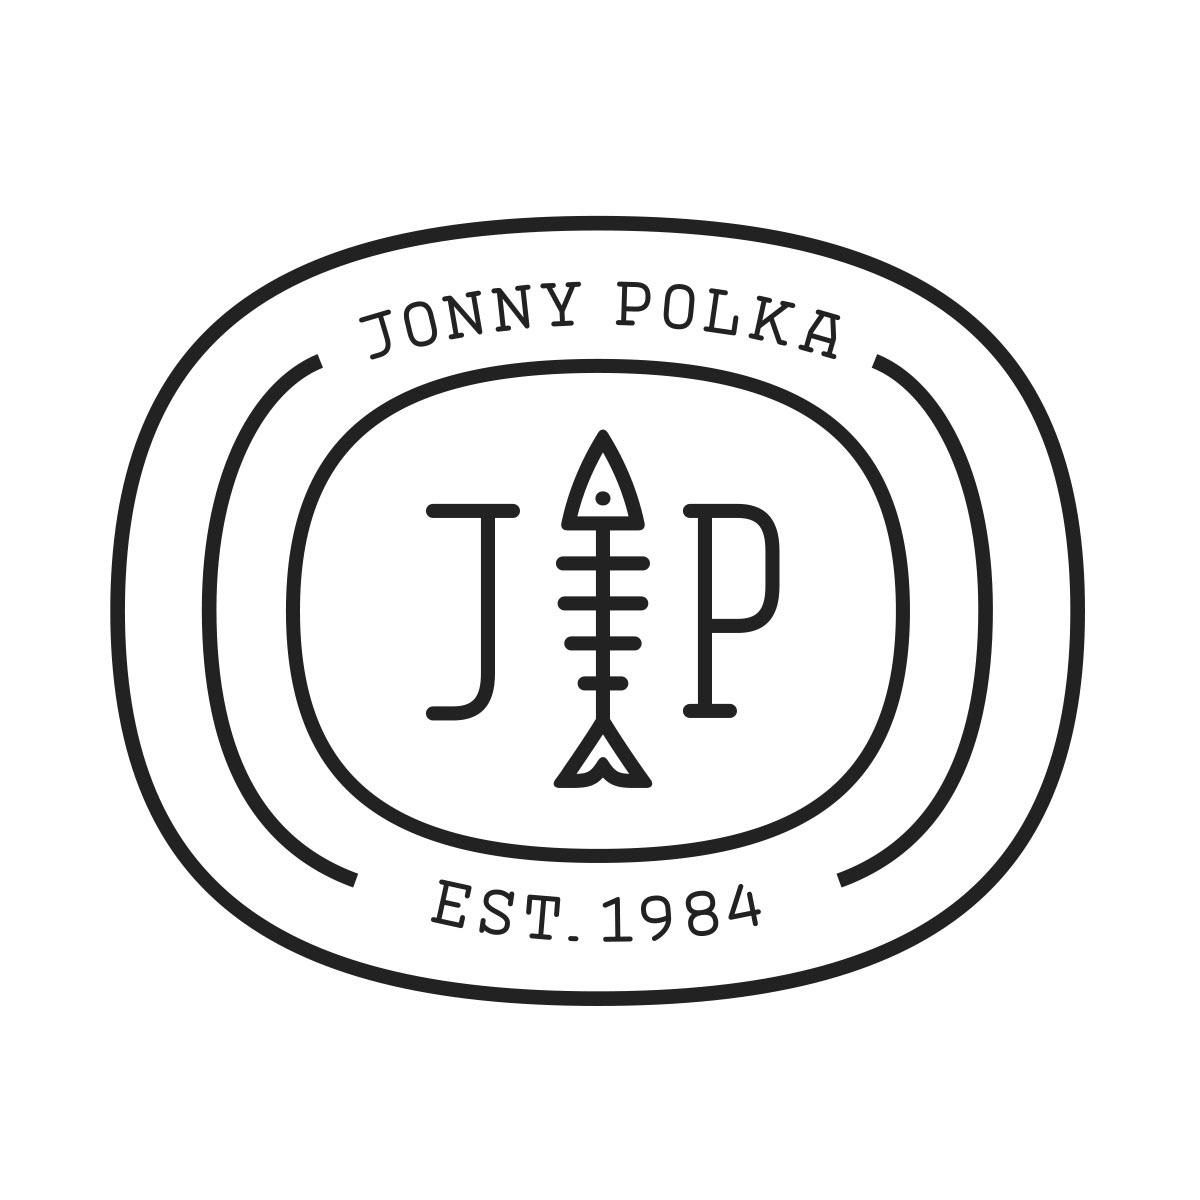 Jonny Polka